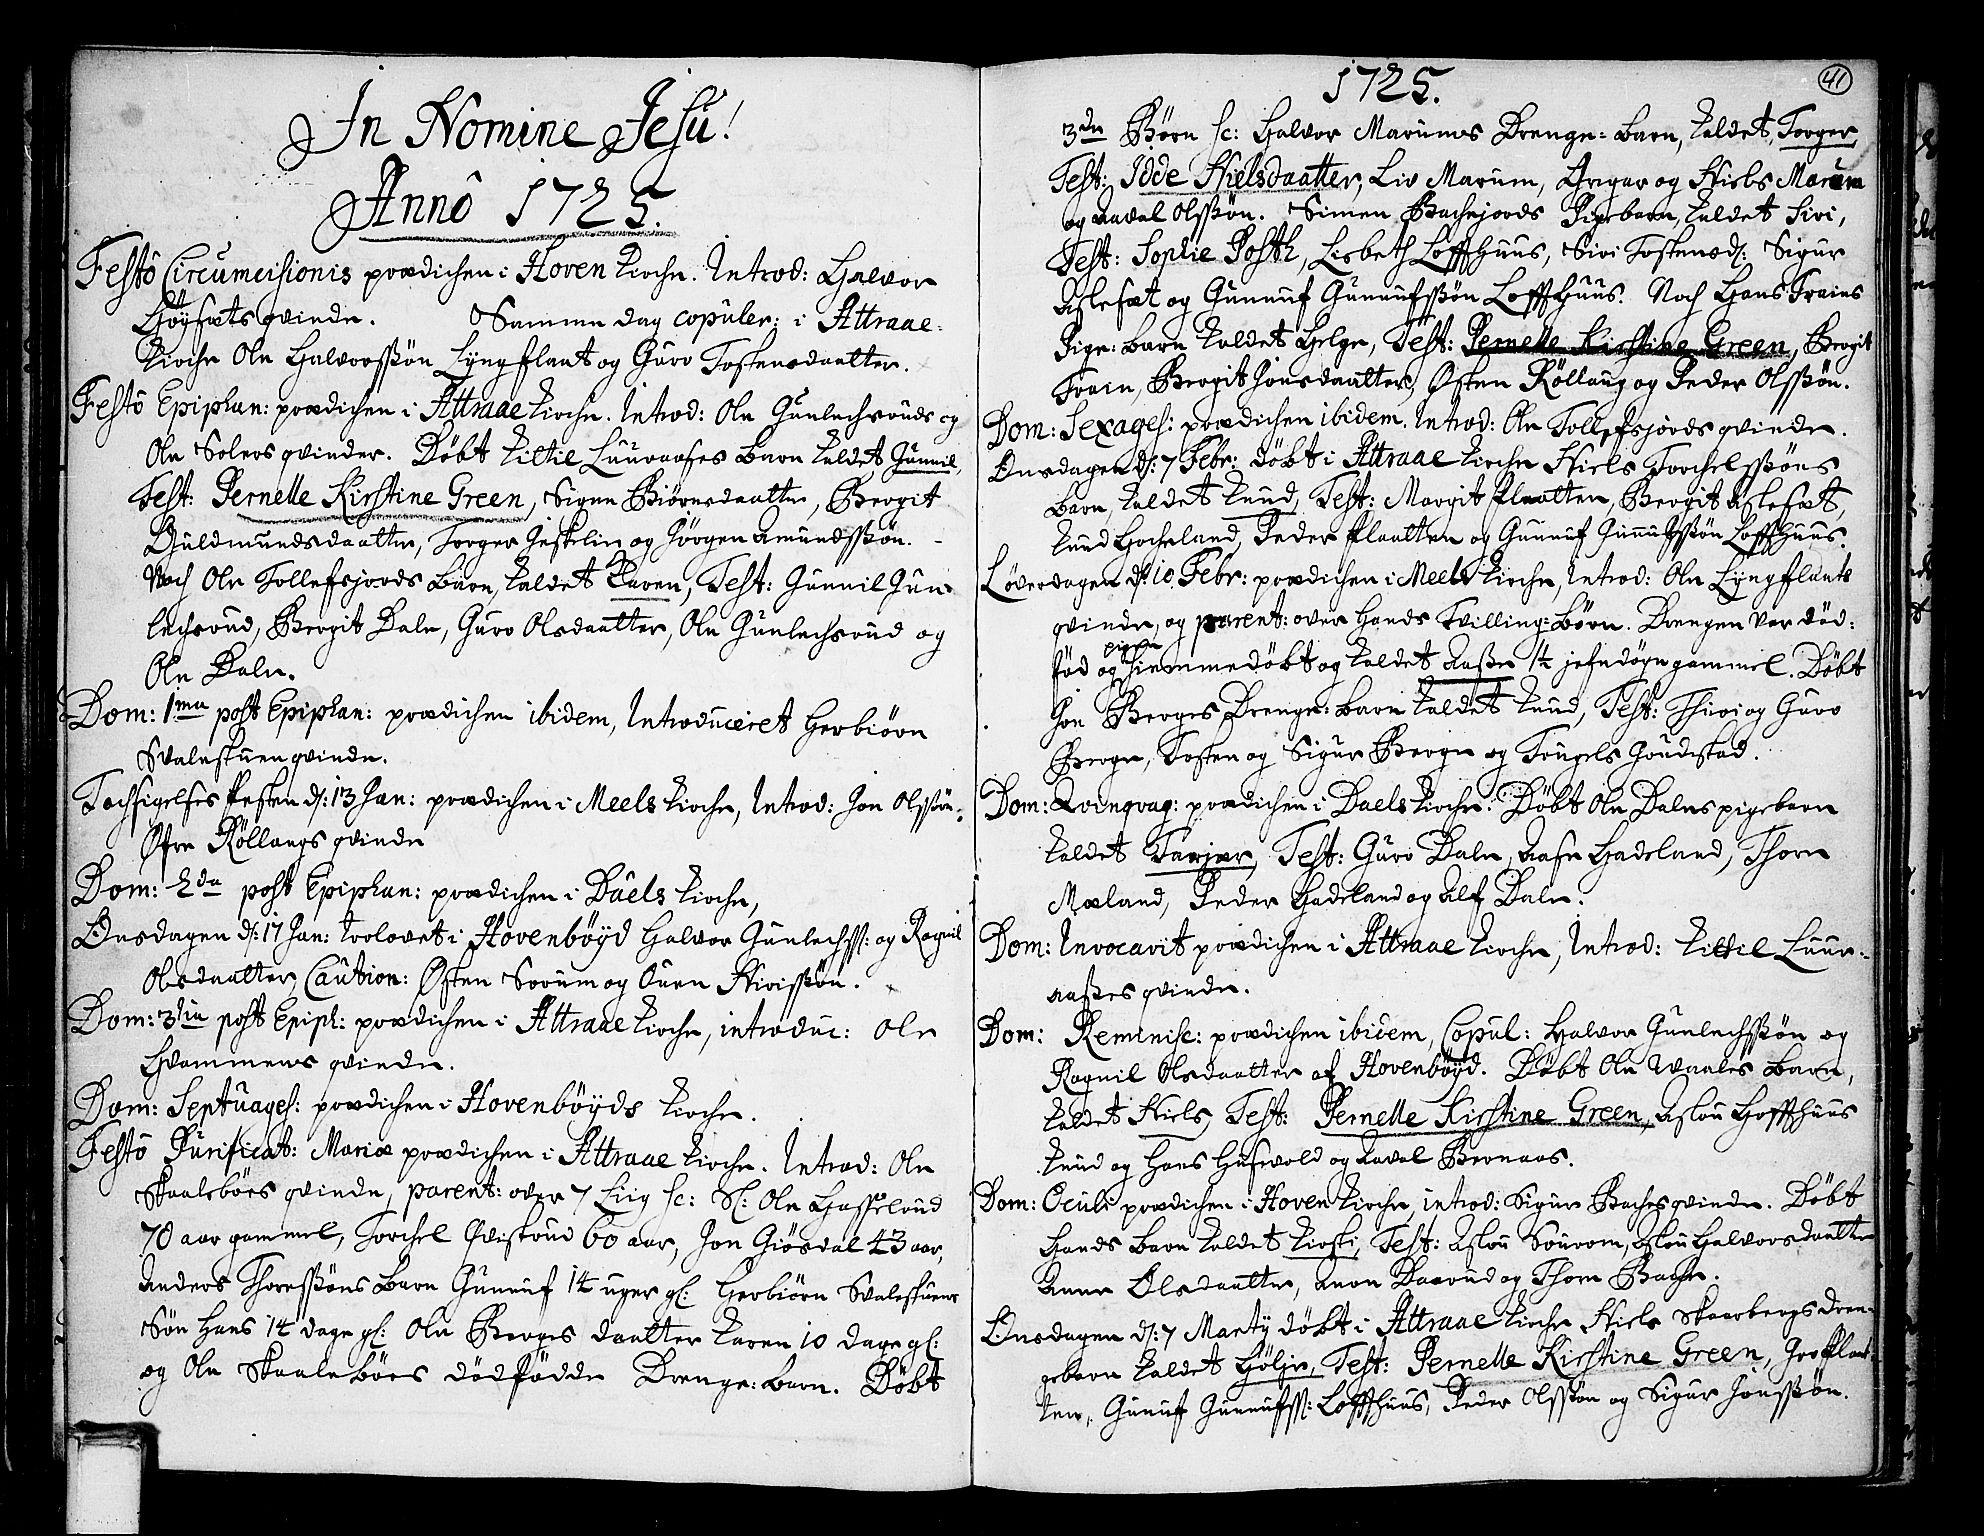 SAKO, Tinn kirkebøker, F/Fa/L0001: Ministerialbok nr. I 1, 1717-1734, s. 41